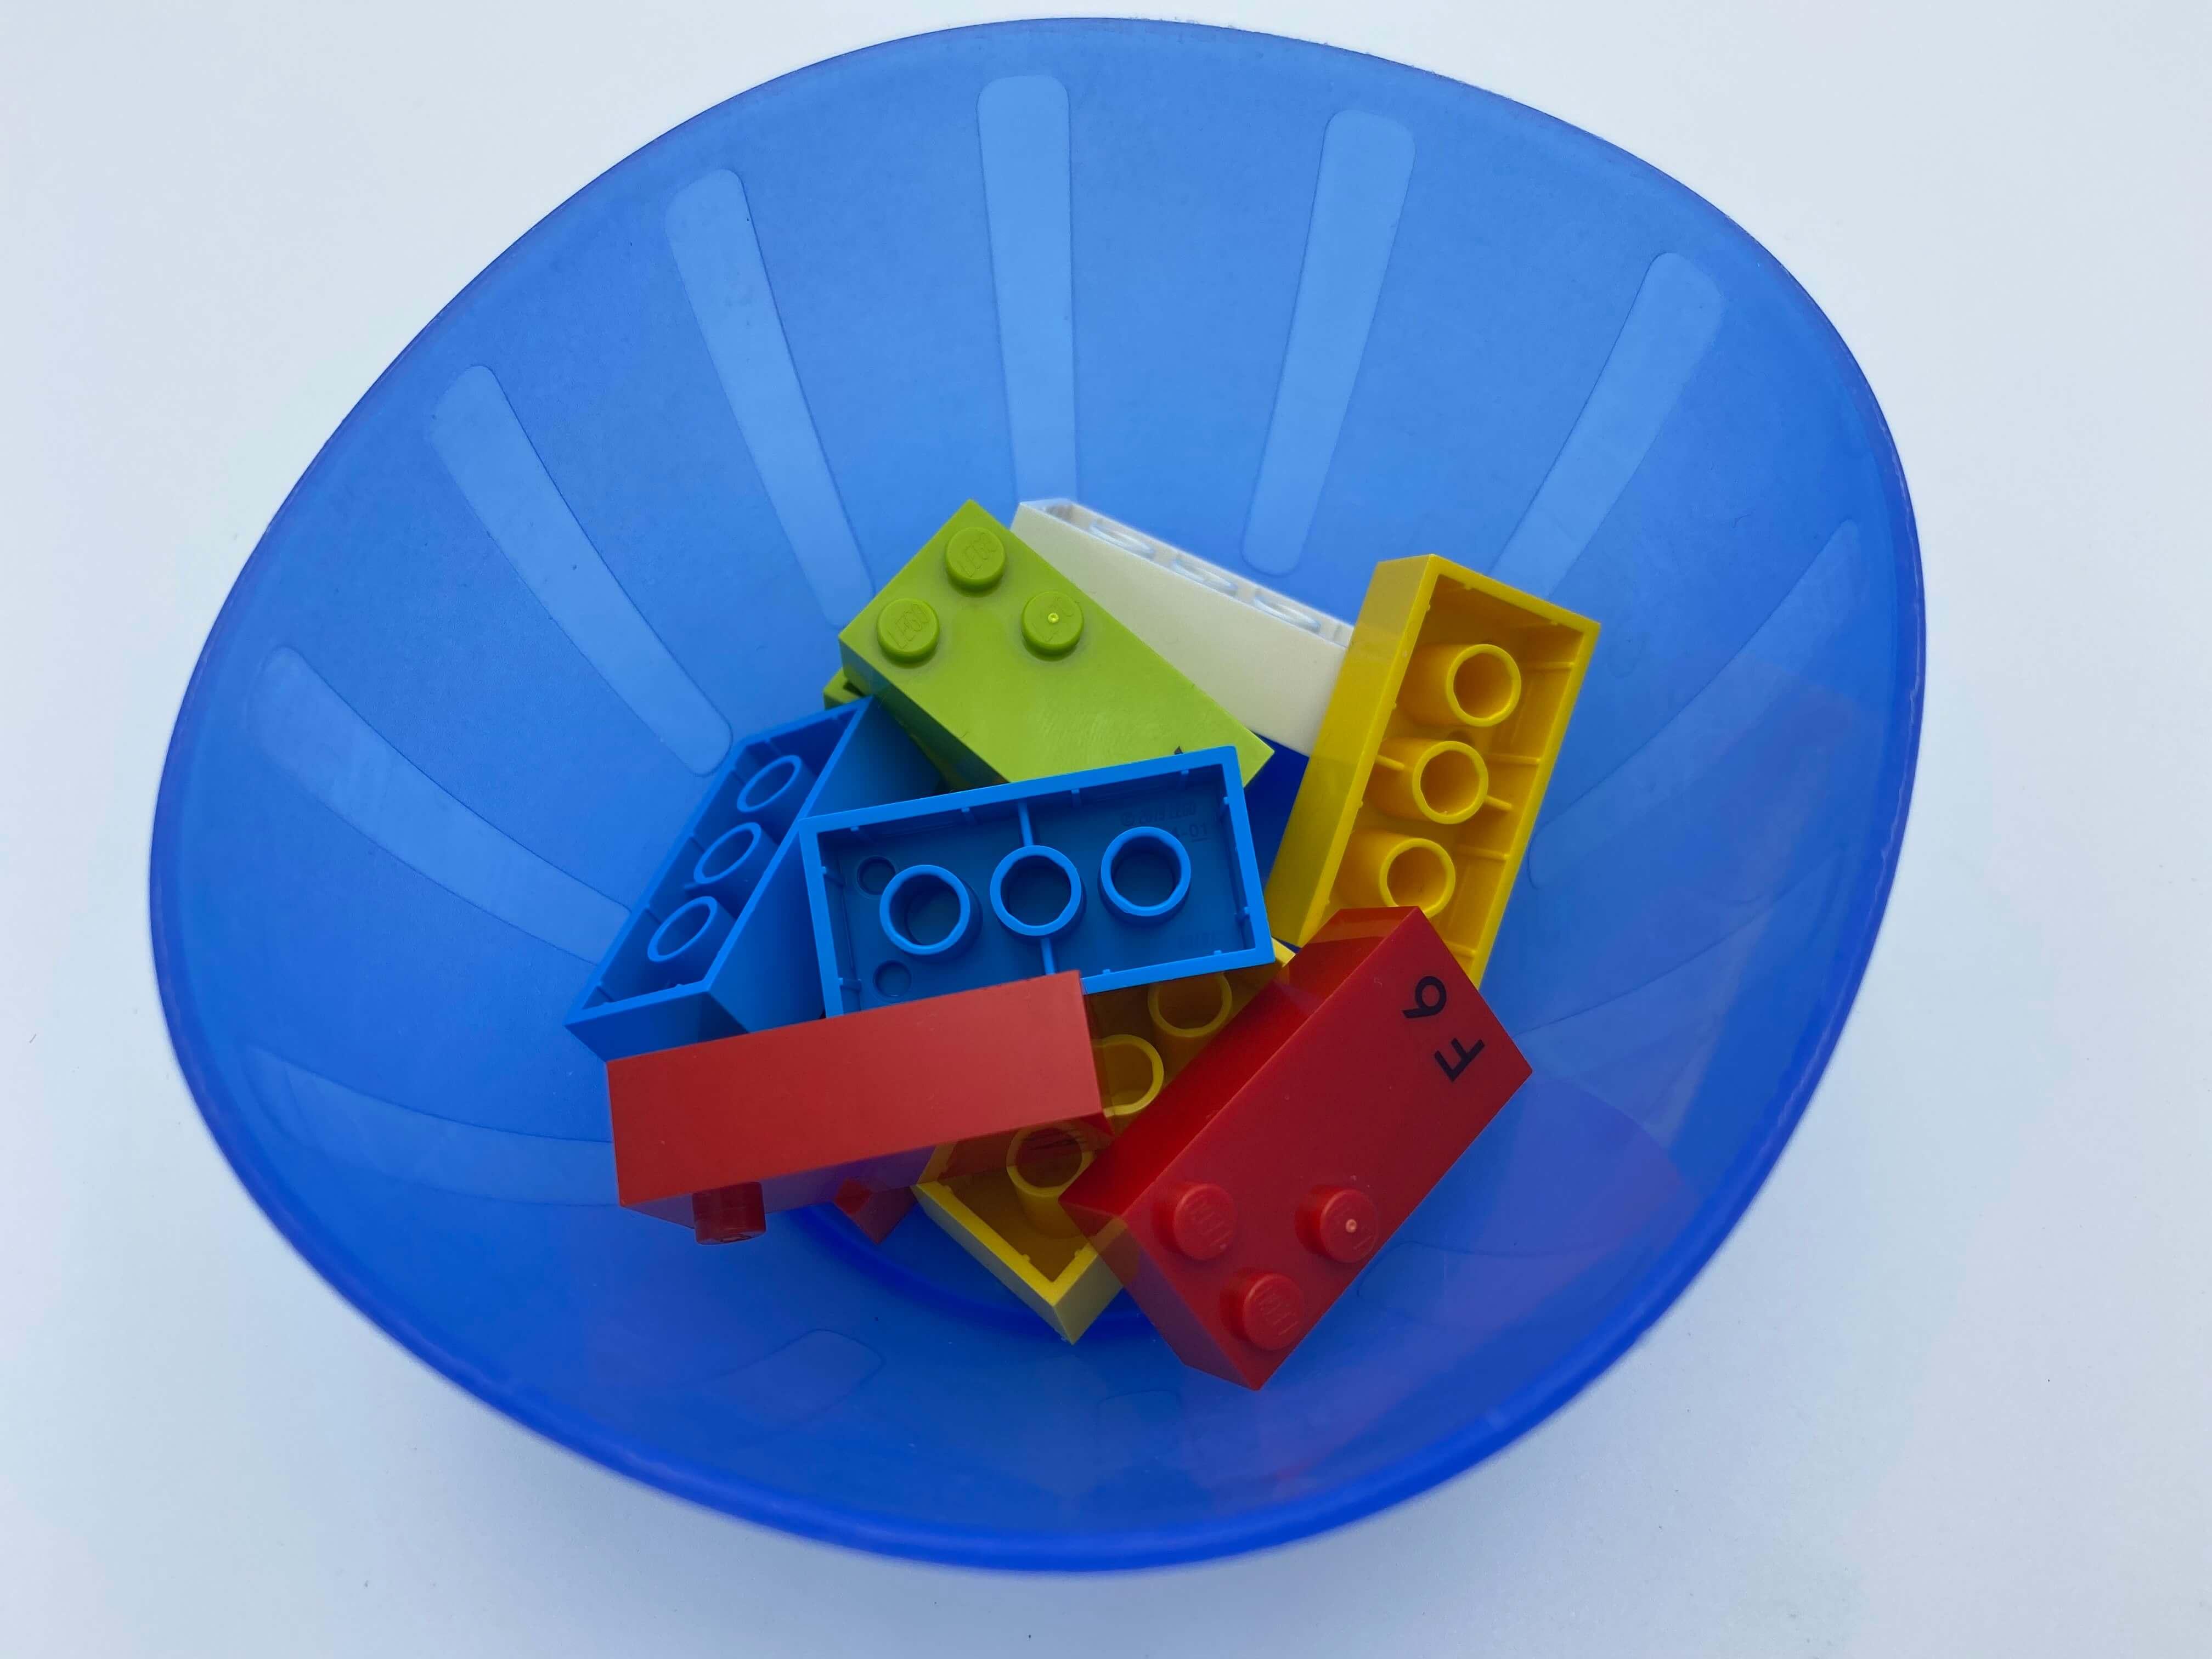 A bowl with 10 bricks.